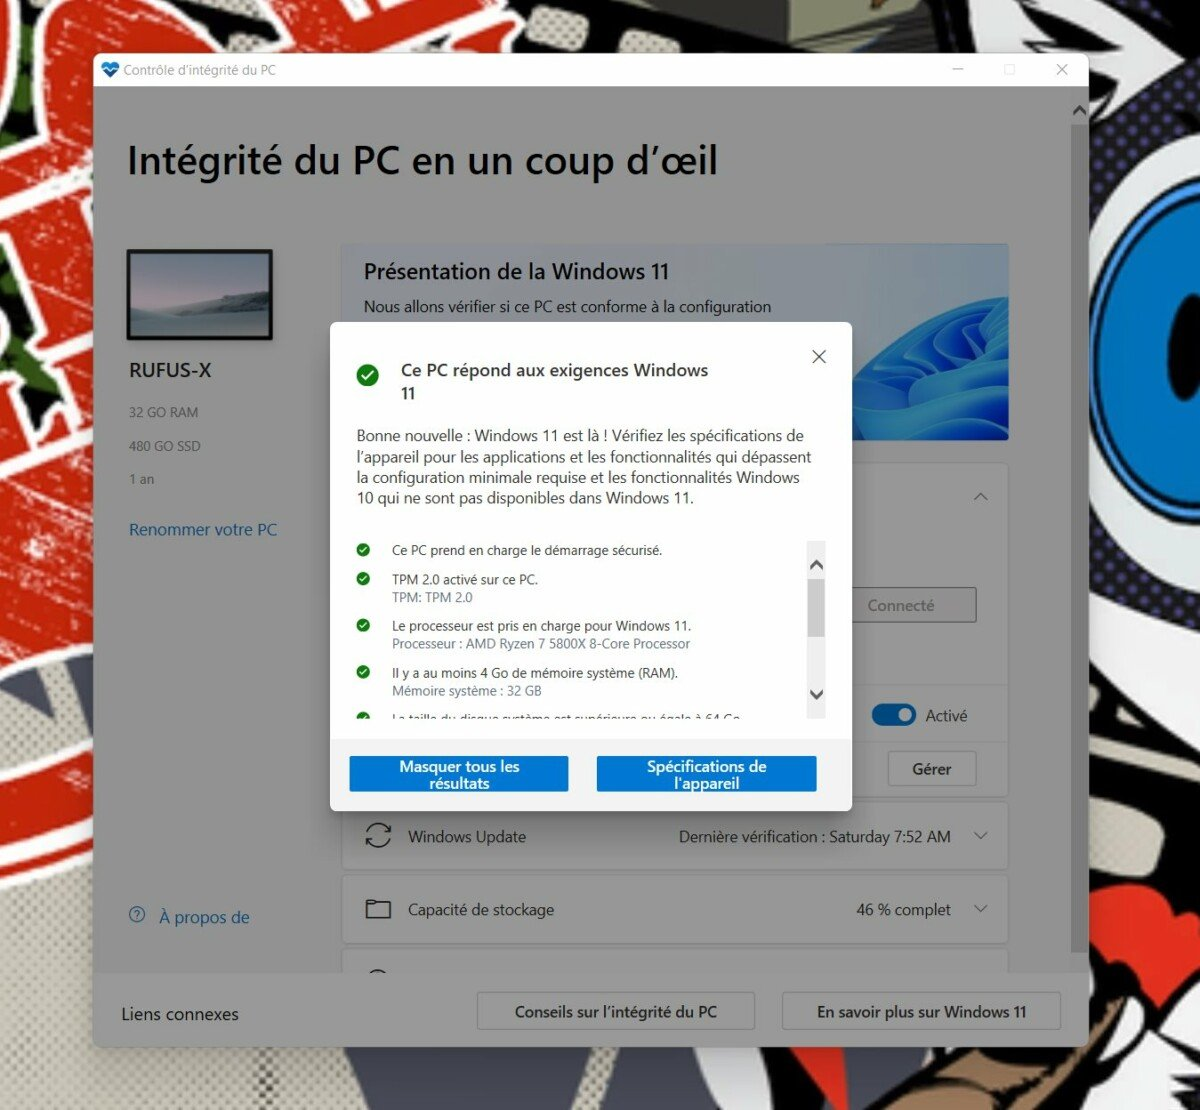 Windows 11: Microsoft explains and modifies minimum requirements